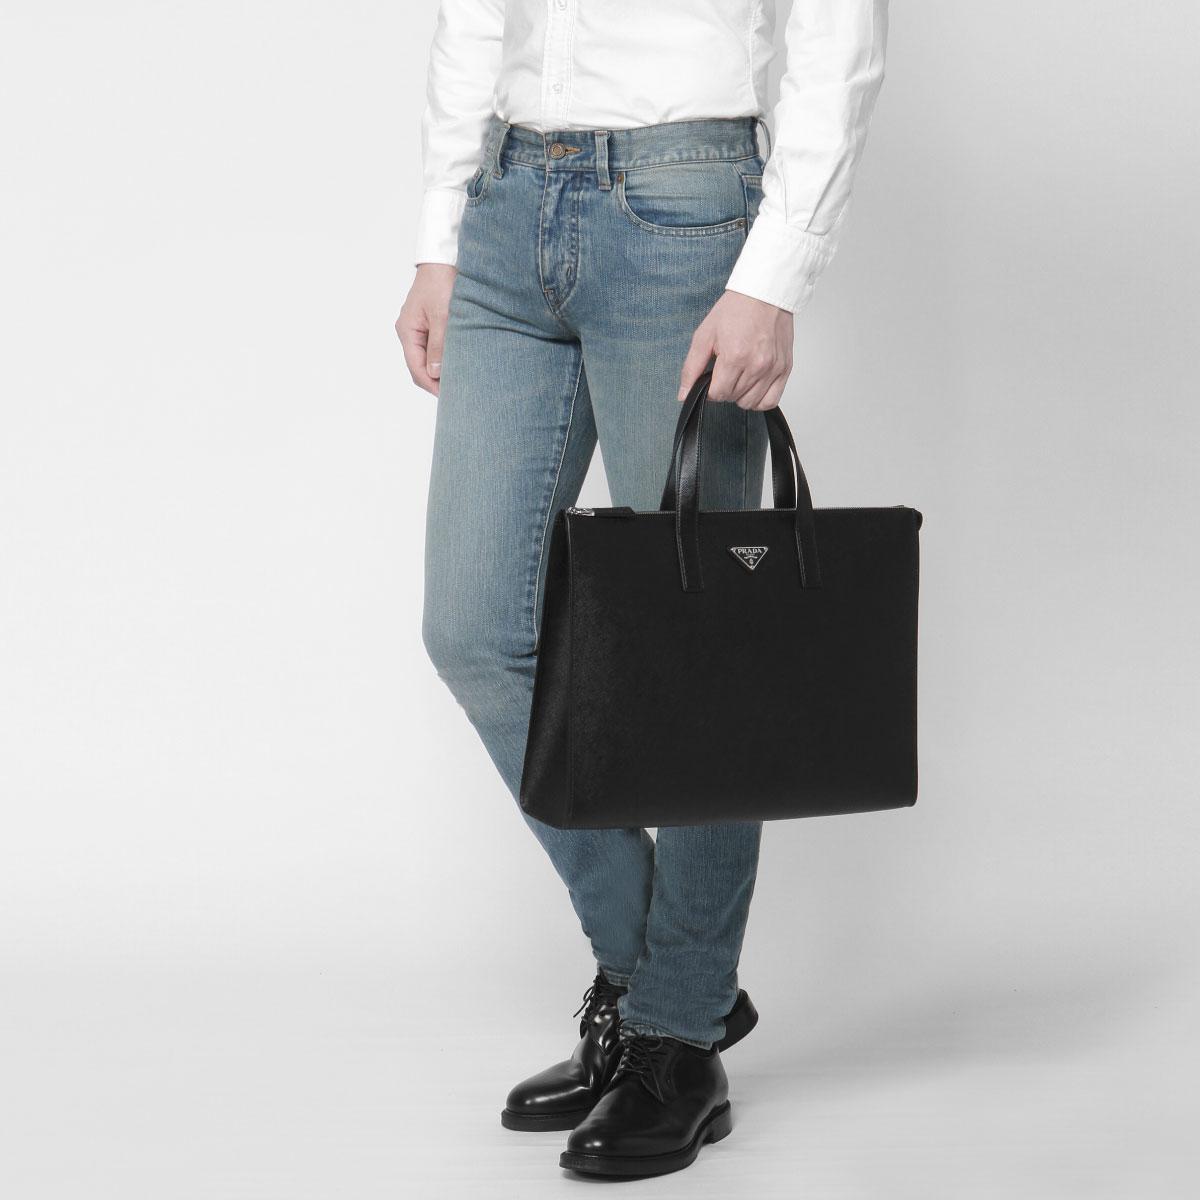 PRADA プラダ   ブリーフケース